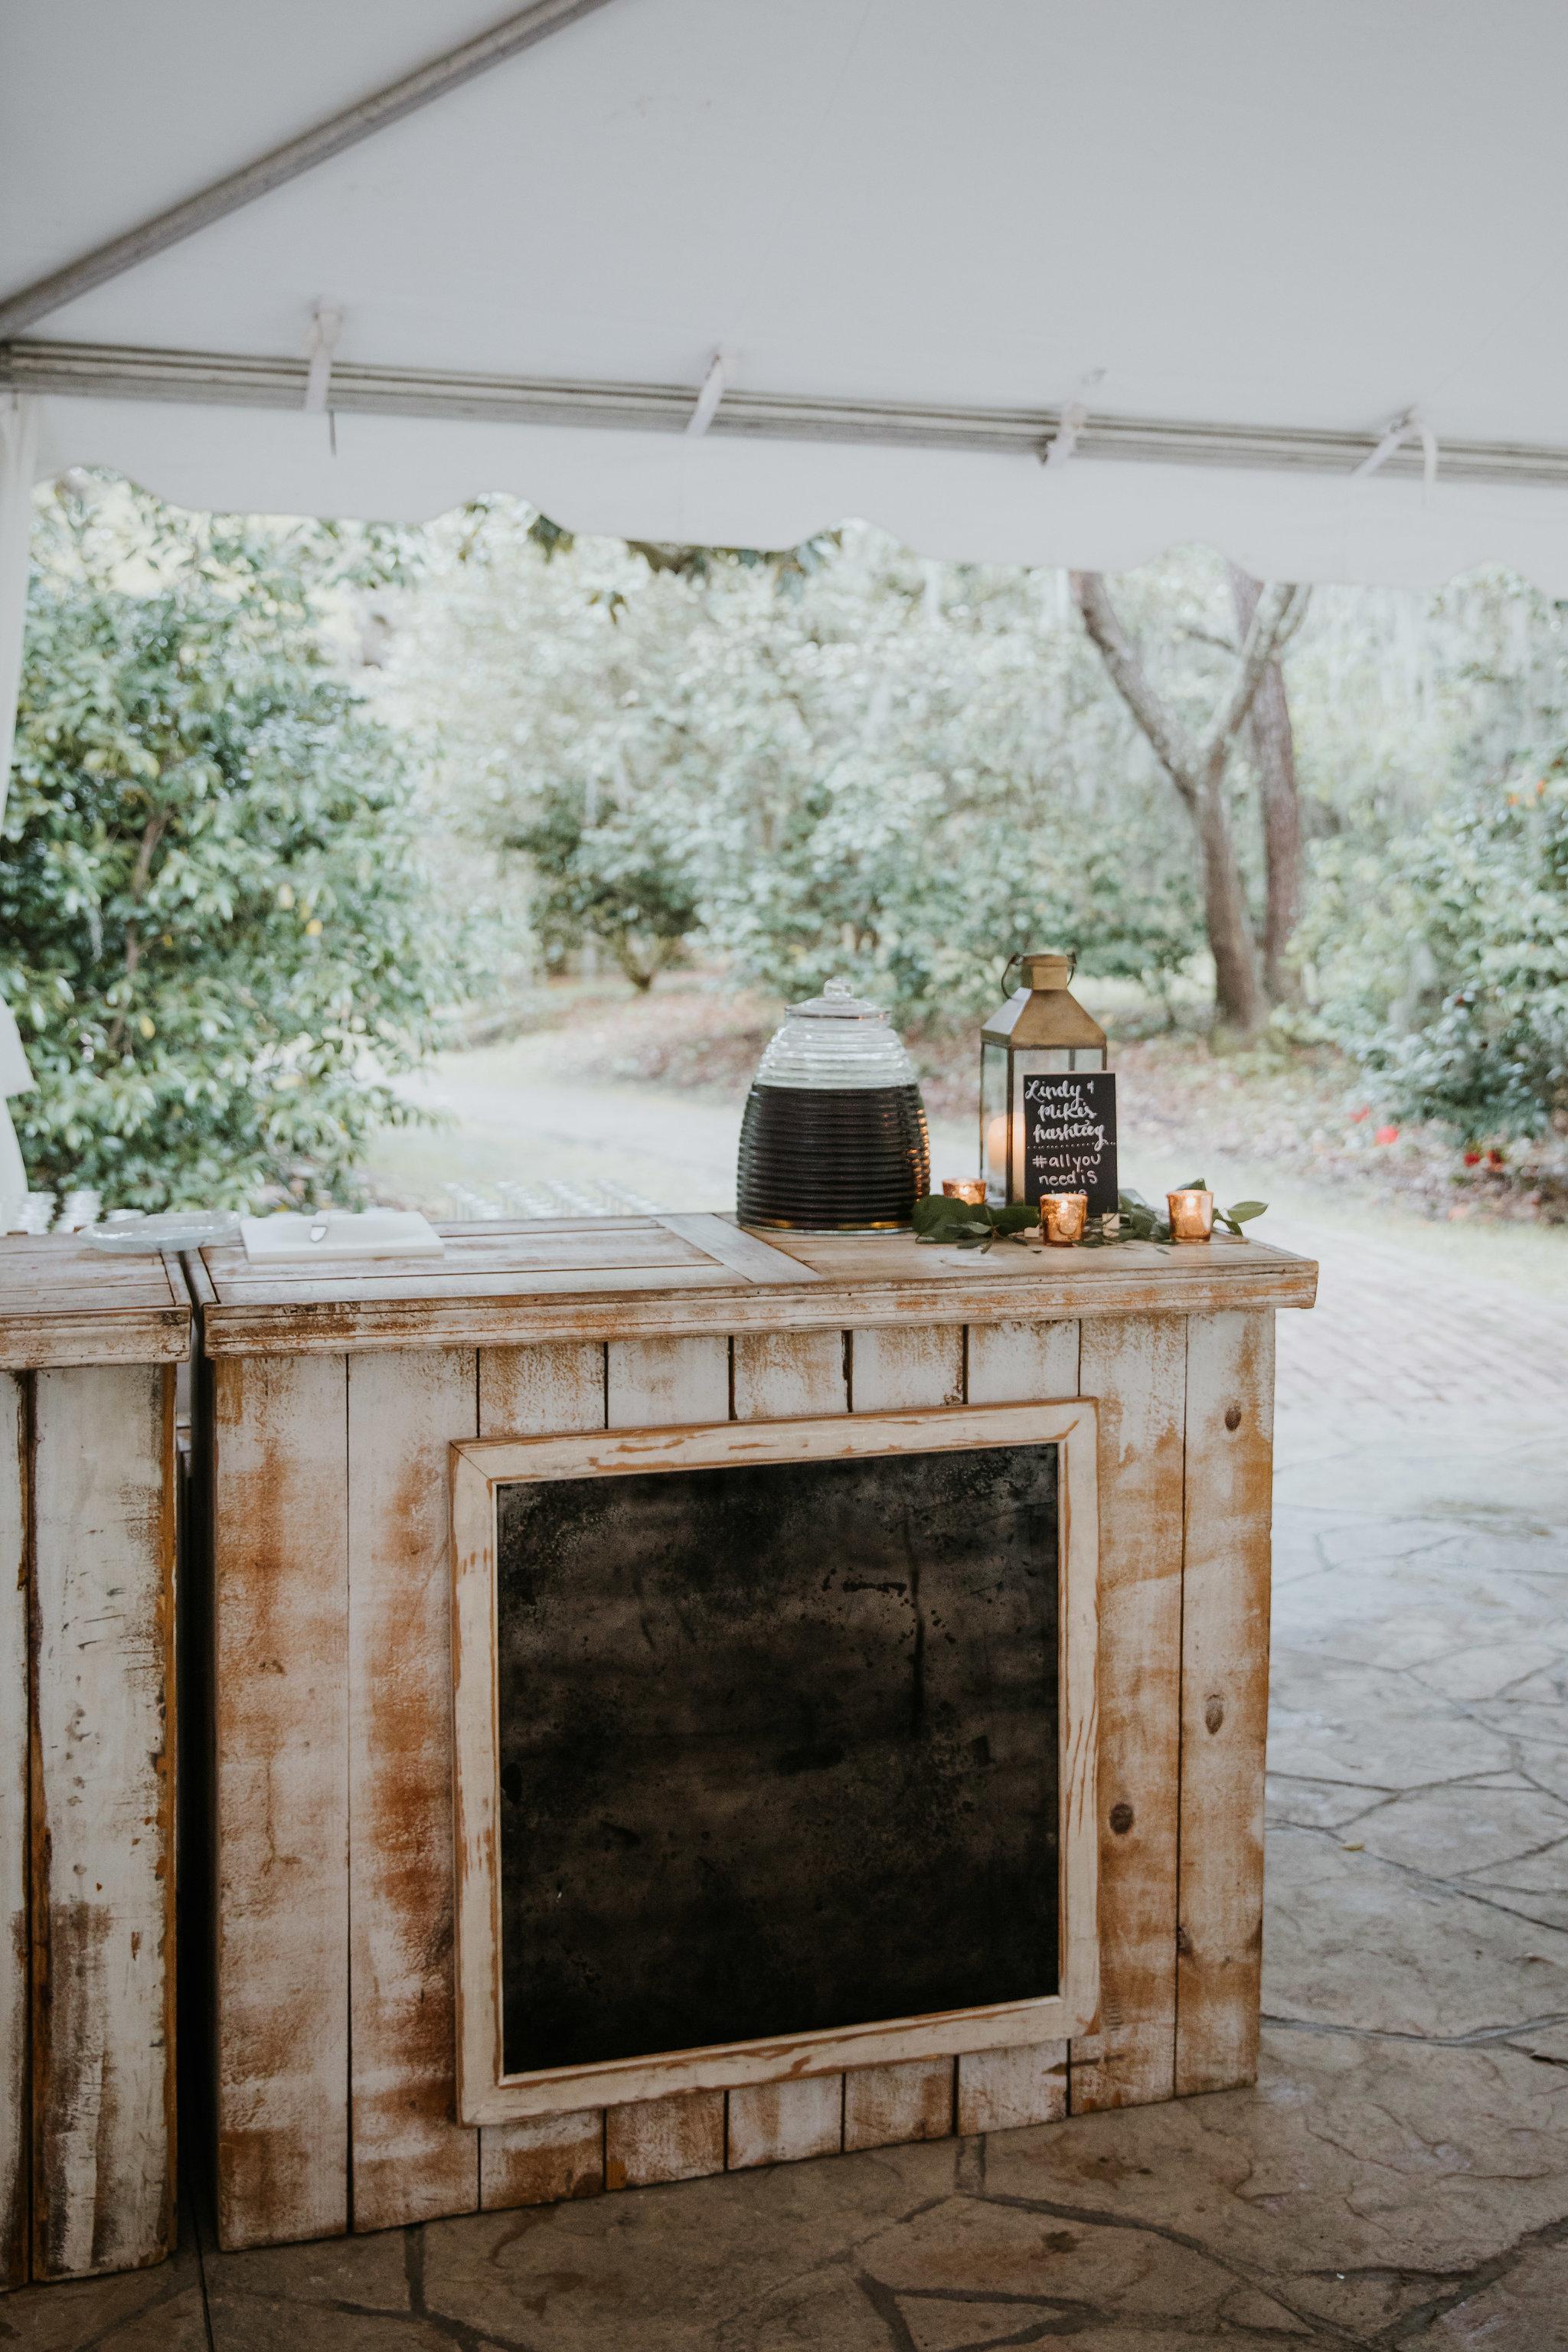 Legare-Waring-House-Charleston-SC-wedding-portrait-photography-431.jpg